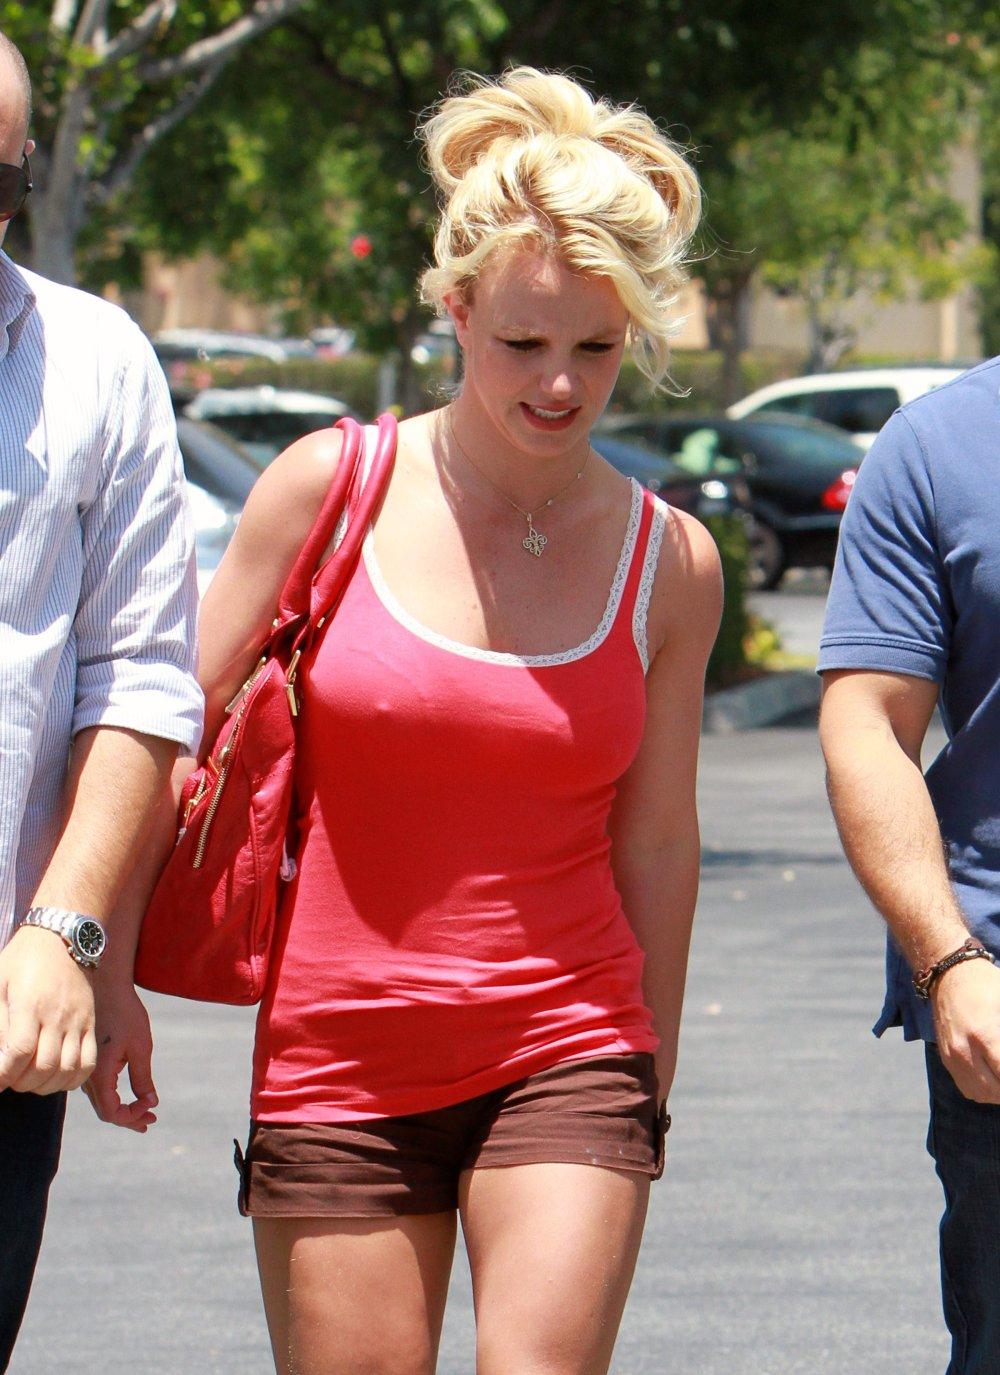 http://4.bp.blogspot.com/_-knQcvB6hEw/TCImO_AEyyI/AAAAAAAAH3c/Fp1pTXBILvk/s1600/Britney+Spears+-+Pokies+%26+Leggy+at+Marmalade+Cafe5.jpg